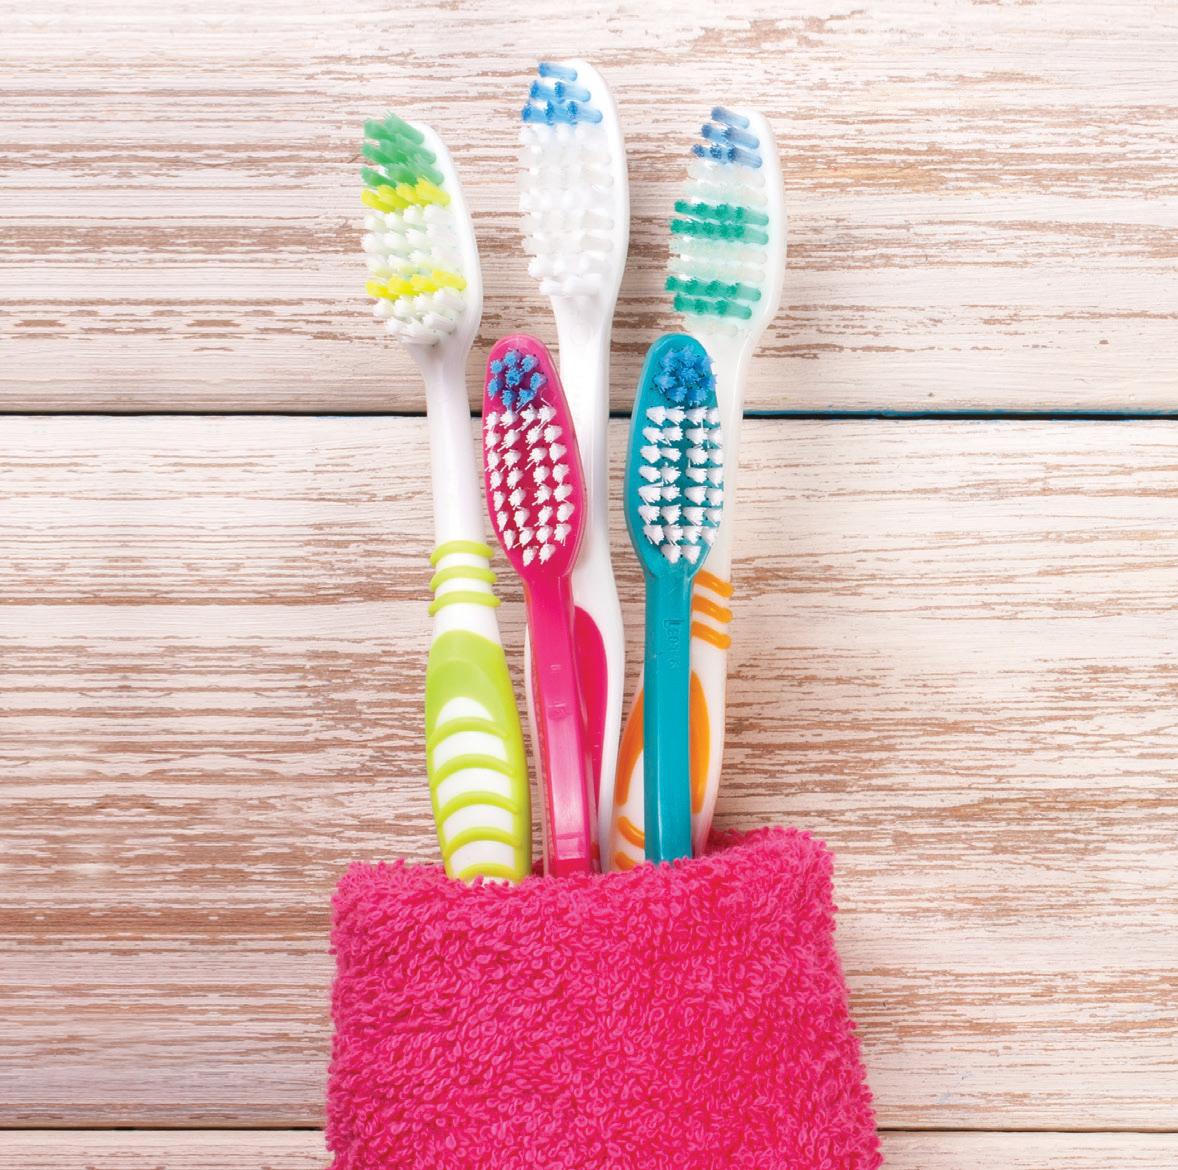 Cuide su cepillo dental